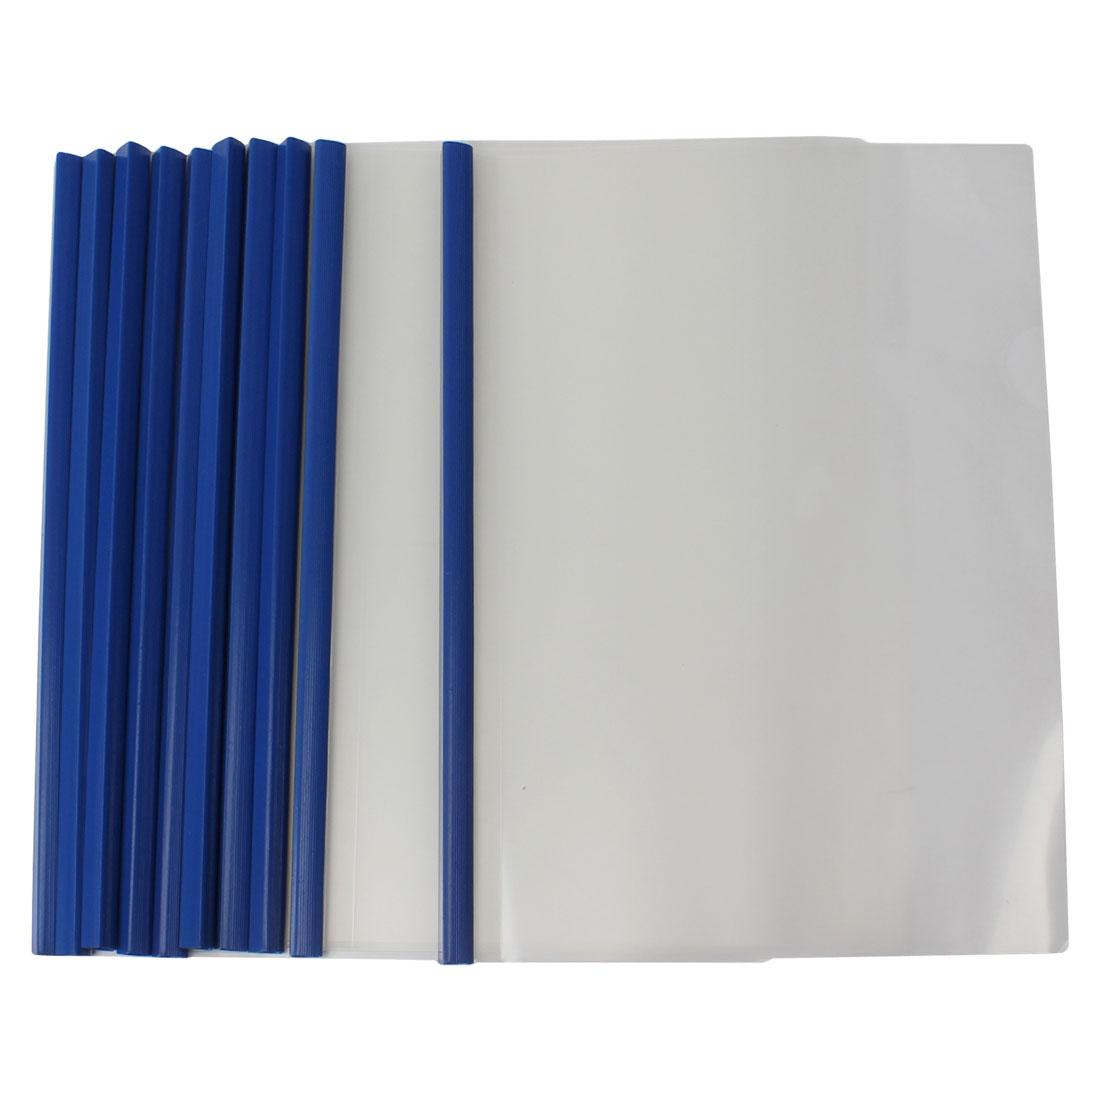 A4 Paper Report Plastic Sliding Bar Cover Strip File Folder Holder Clear 10 PCS